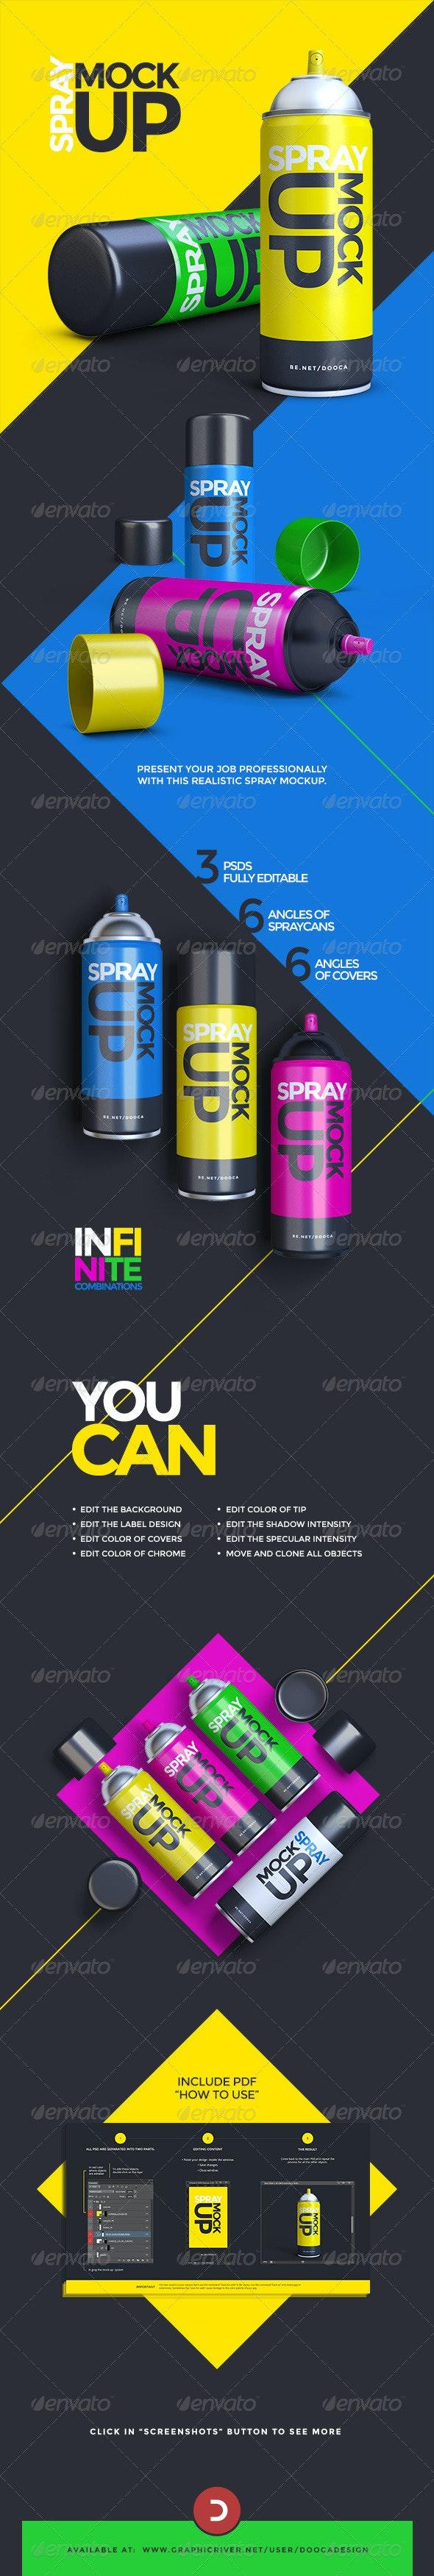 Aerosol Spray Can Mockup - Miscellaneous Product Mock-Ups